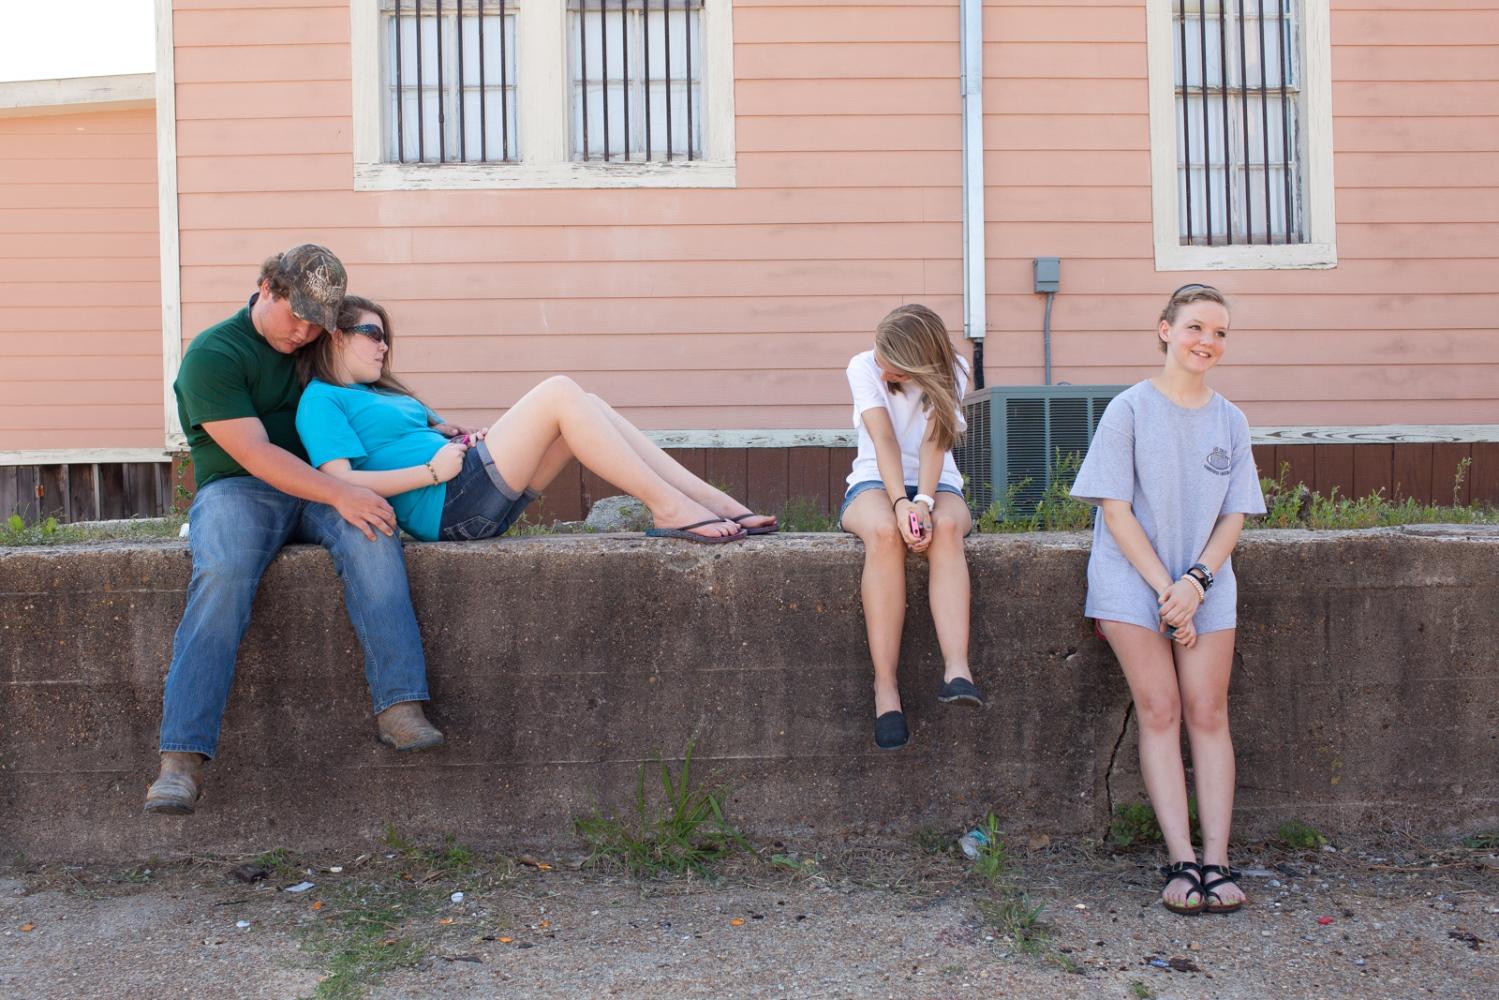 Art and Documentary Photography - Loading Juke_LindsayMorris_2012-504.jpg